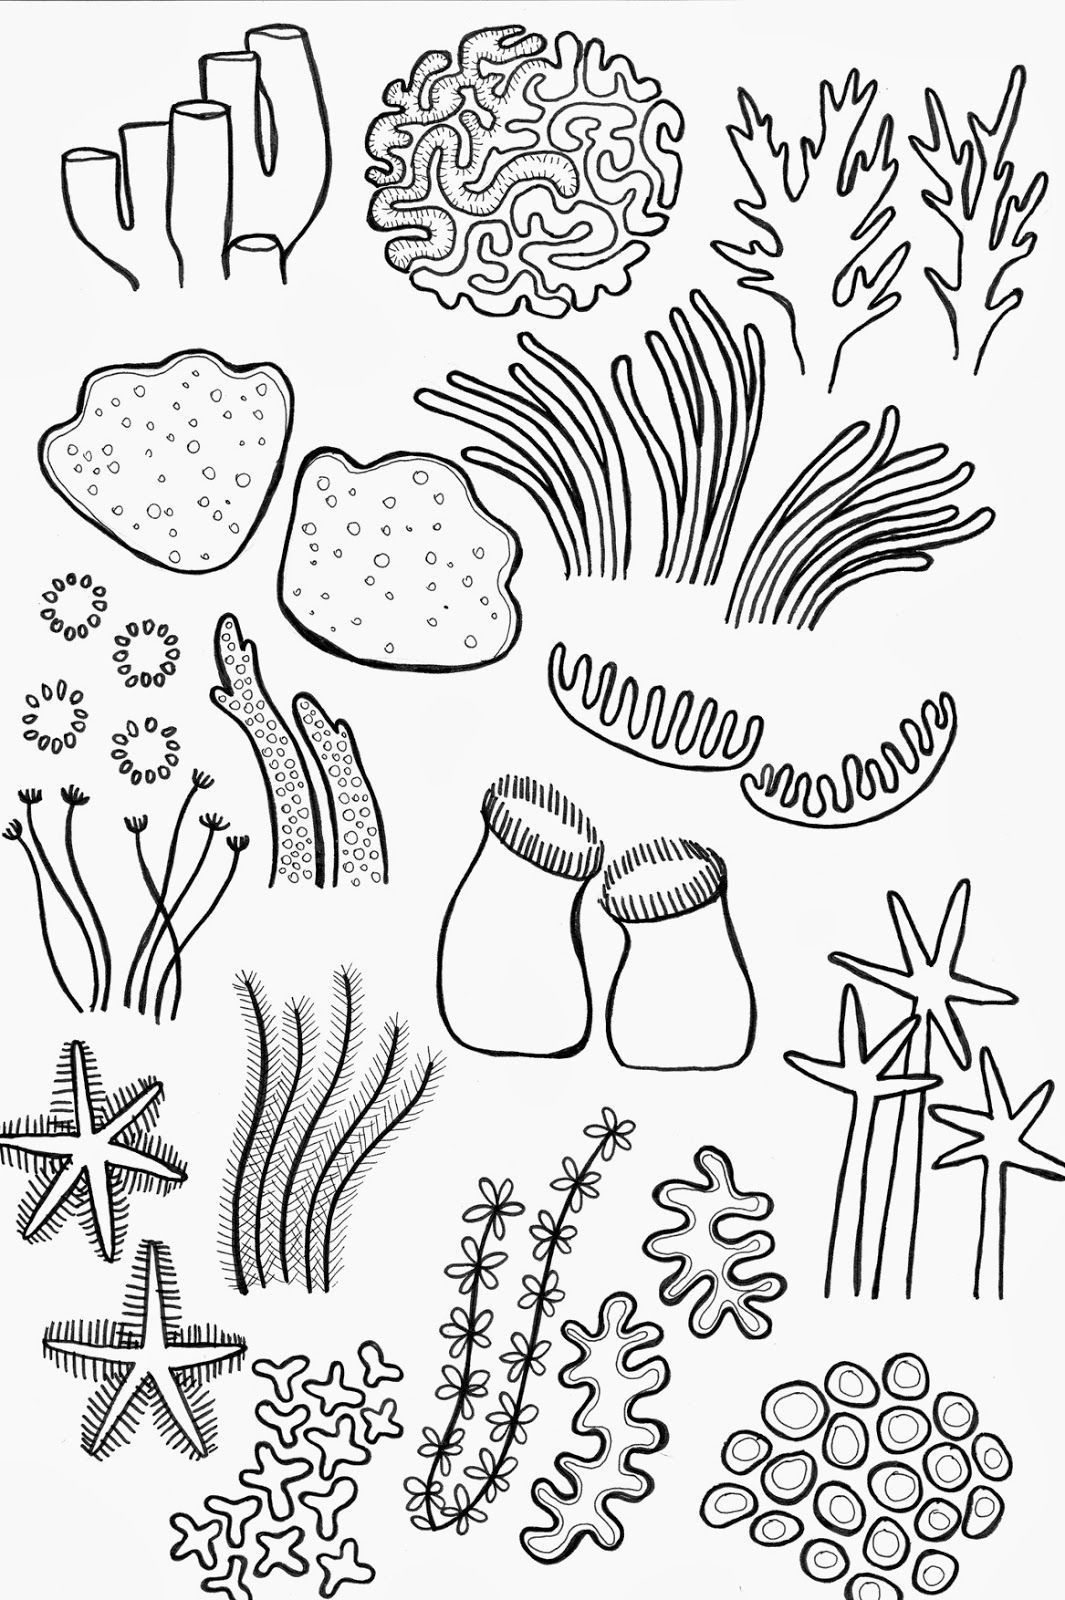 Prentice Hall 9 3 Cnidarians Smithlifescience Coral Reef Art Ocean Plants Ocean Habitat